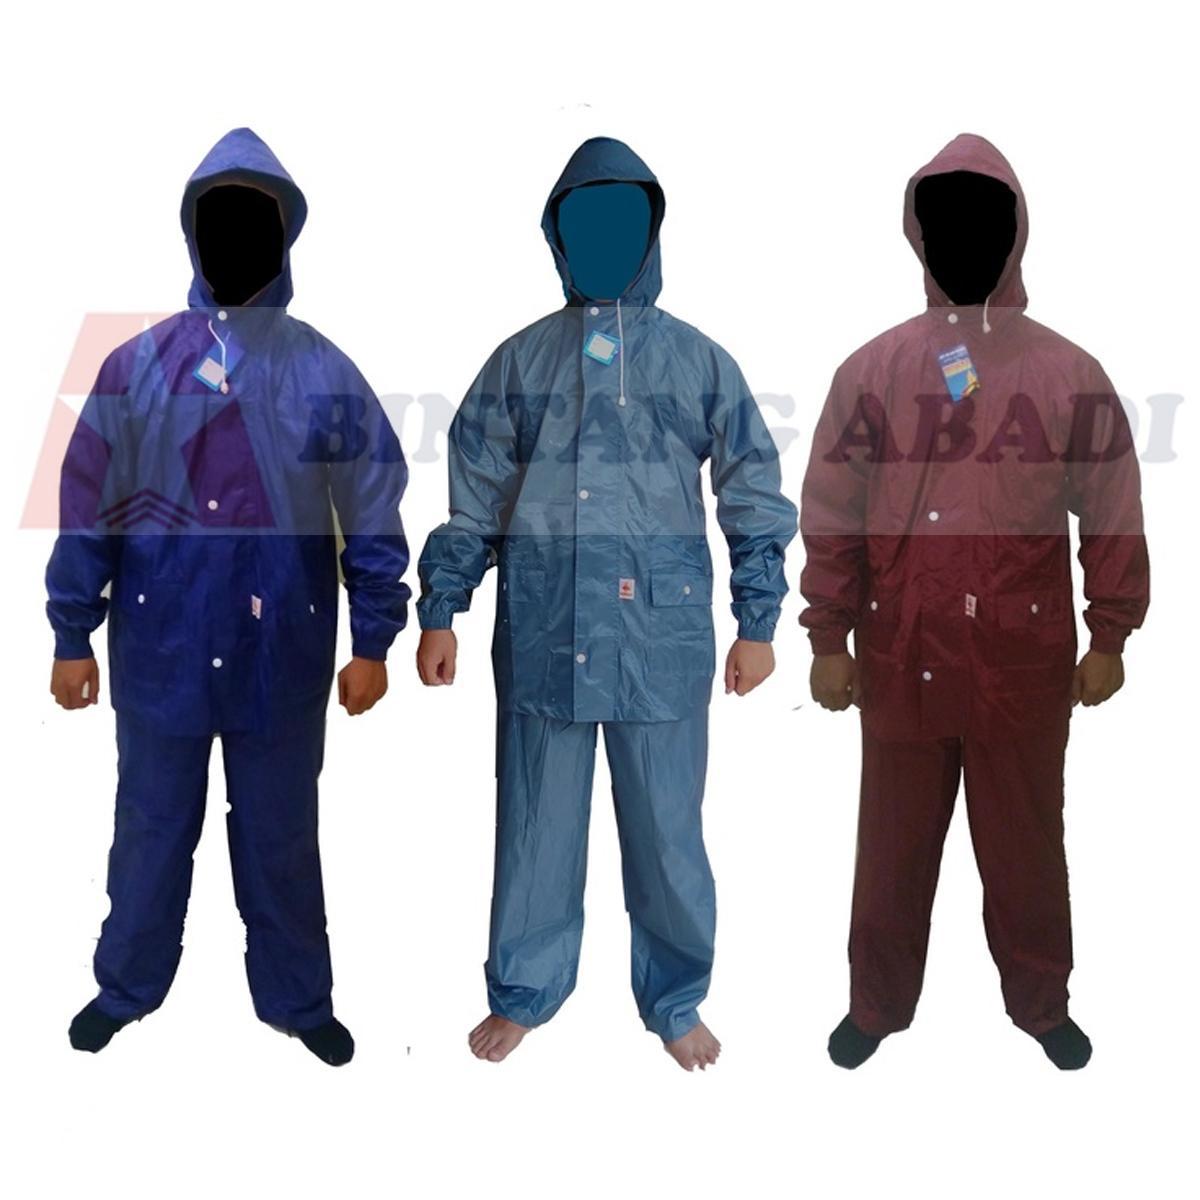 Termurah Monas N41 Jas Hujan Nylon Baju Jaket Celana / Raincoat Aneka Warna Harga Grosir